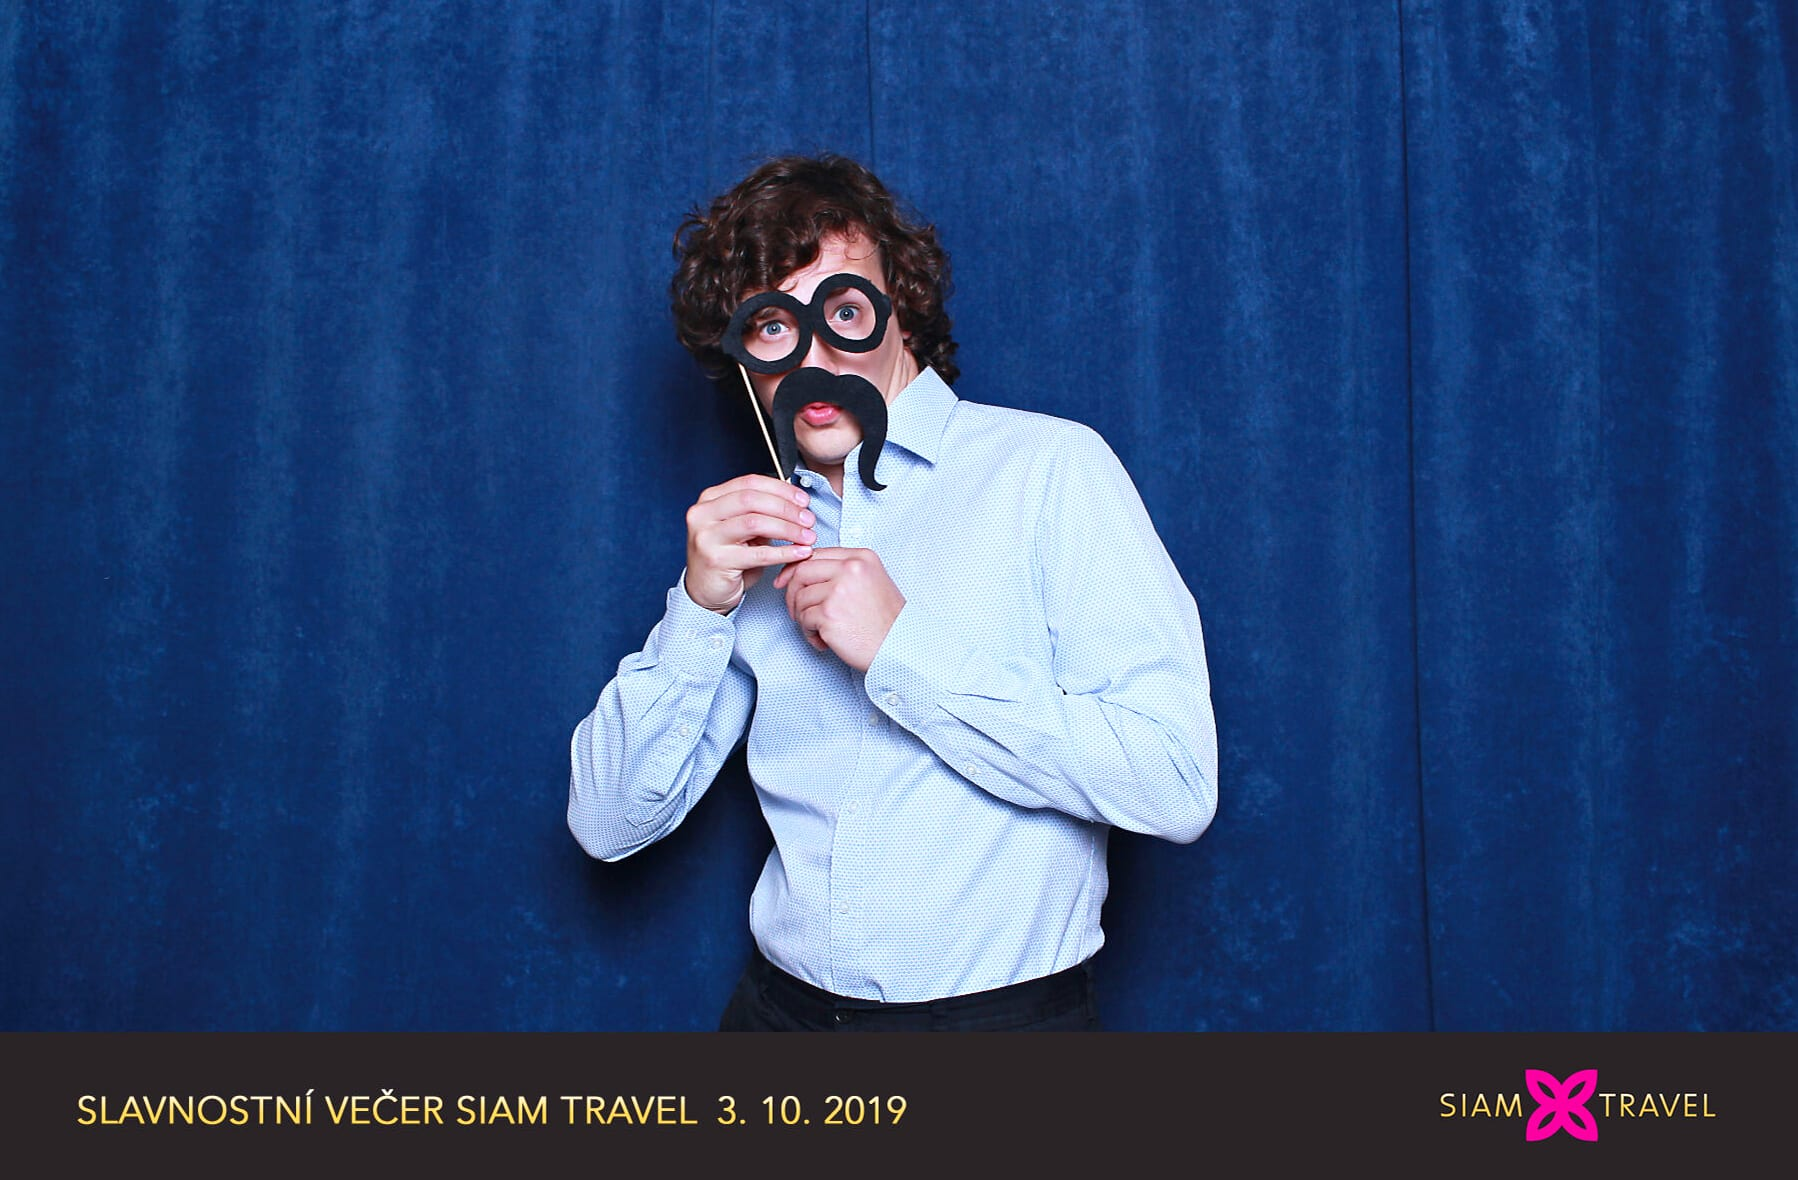 fotokoutek-firemni-vecirek-praha-siam-travel-3-10-2019-660122